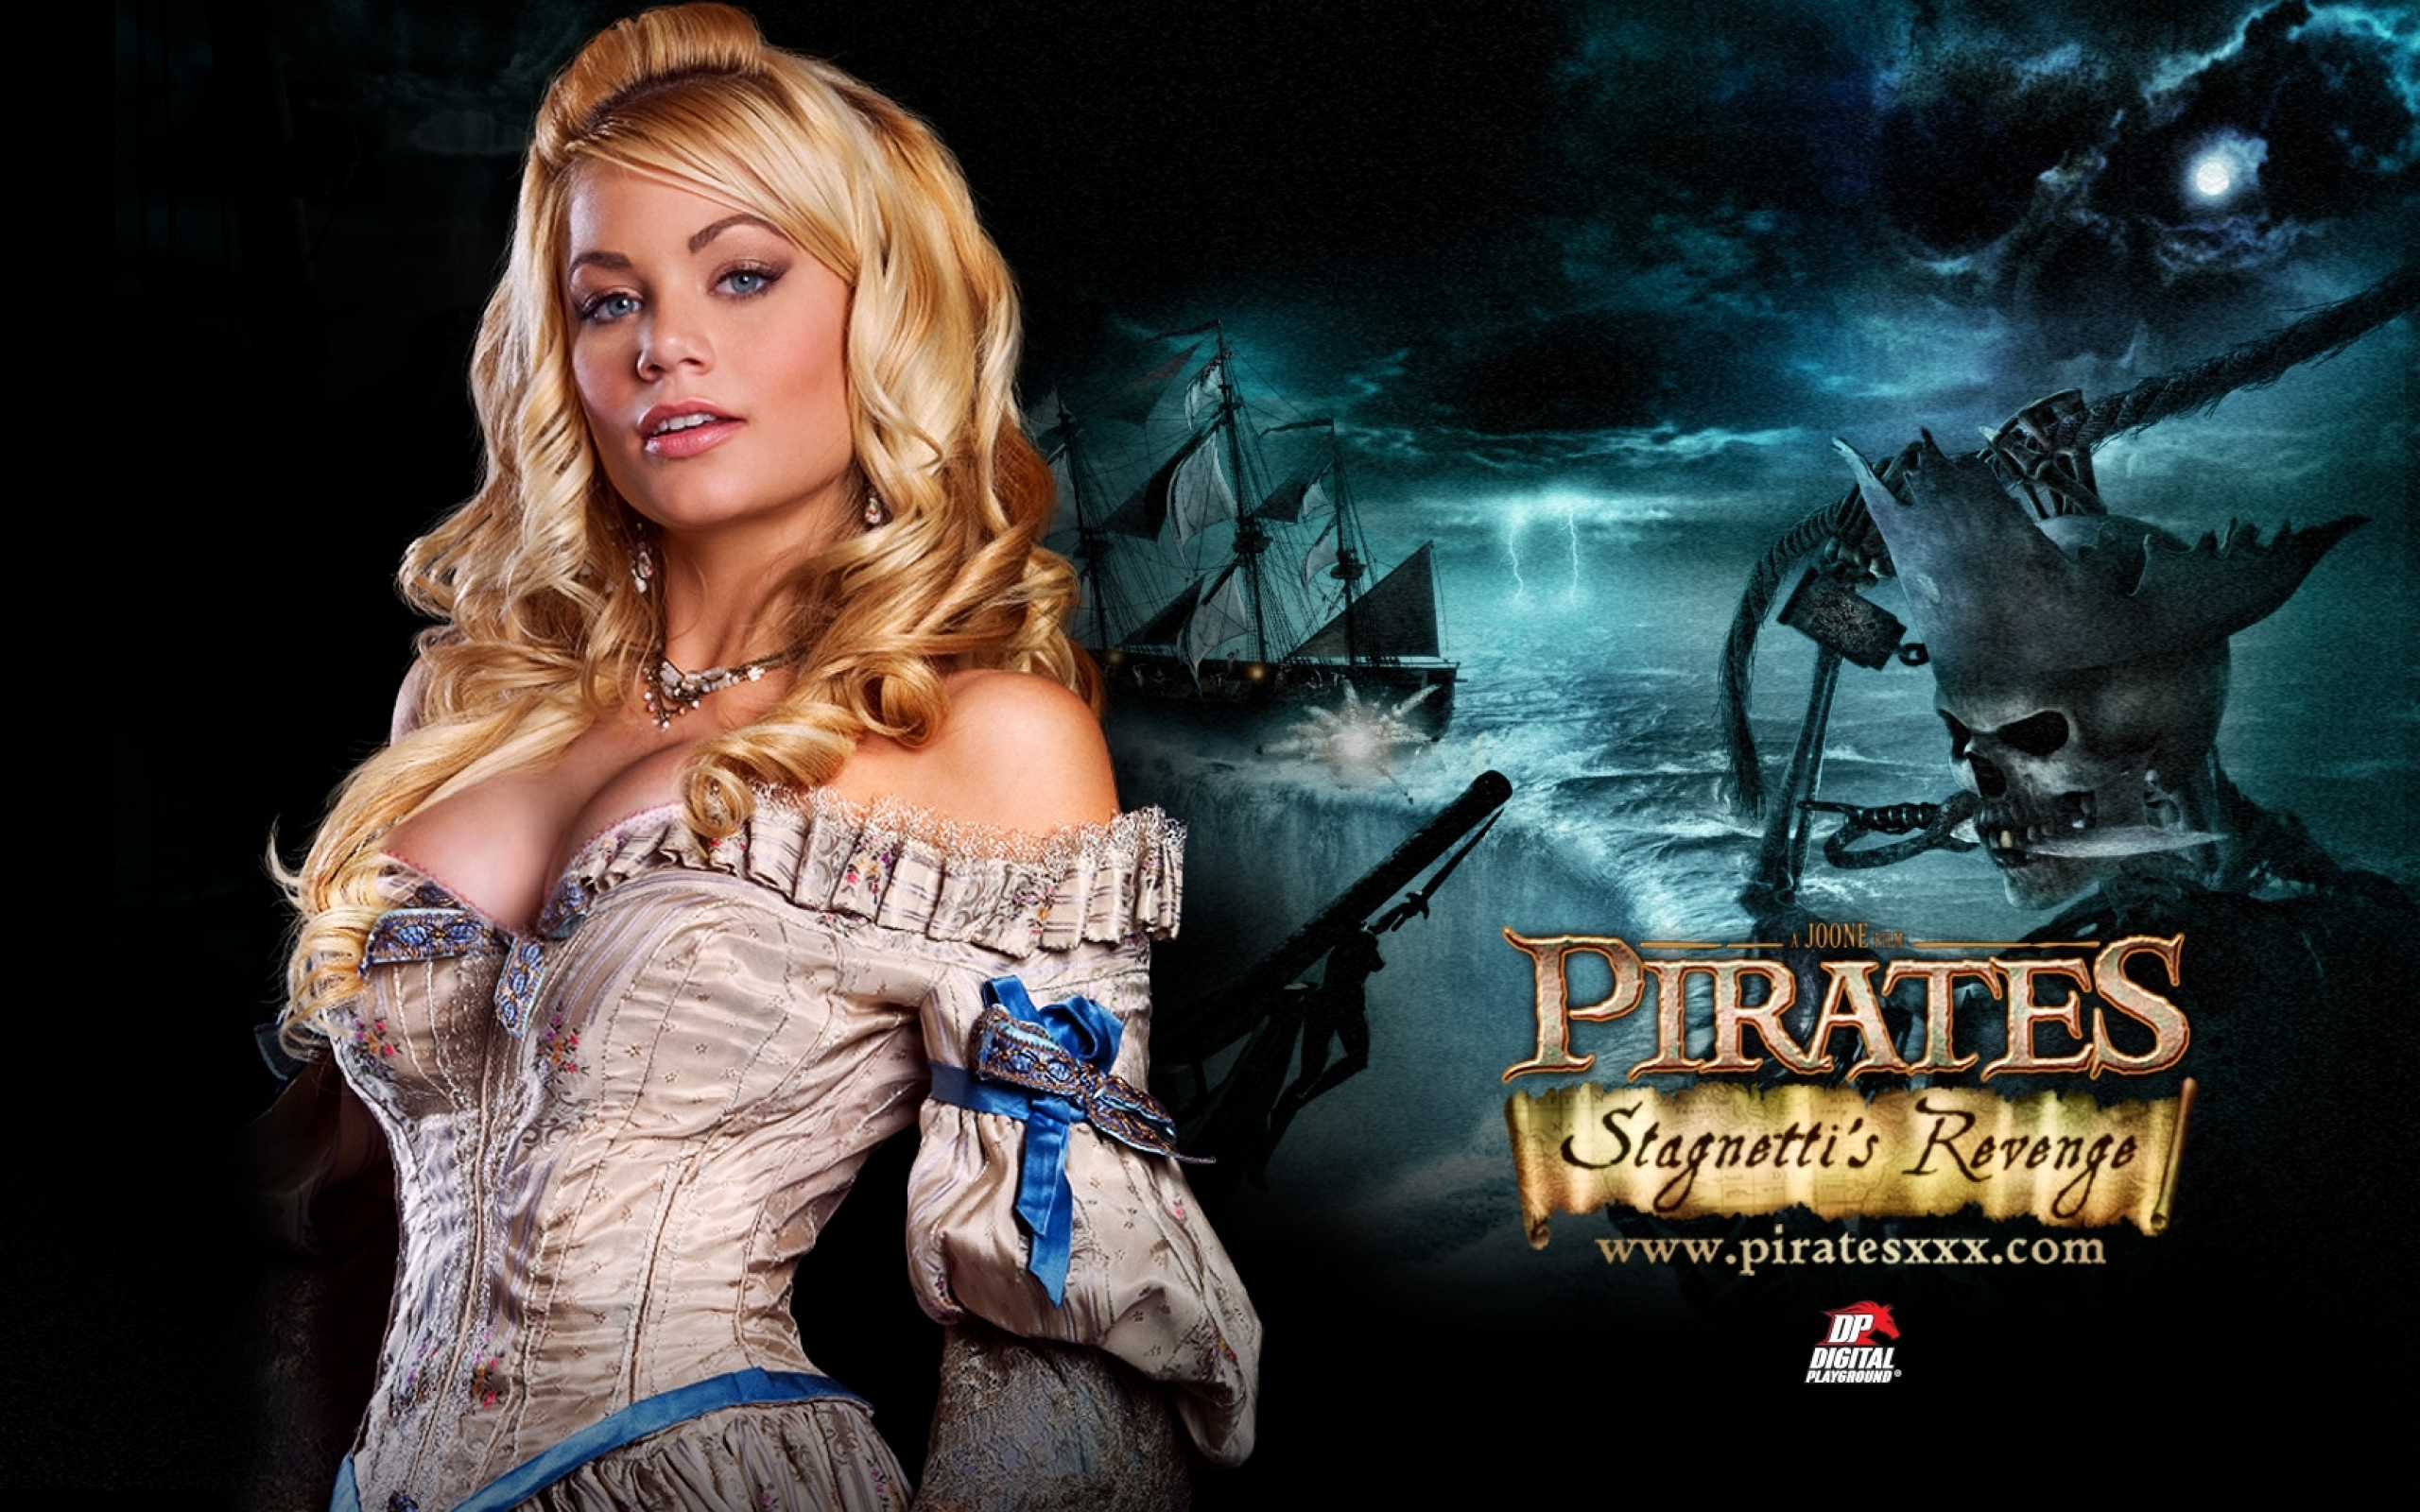 Pirates_2005_jesse_jane_pic01 Jpg Pirates_2005_katsumi_pic01 Jpg Pirates_2005_riley_steele_pic01 Jpg